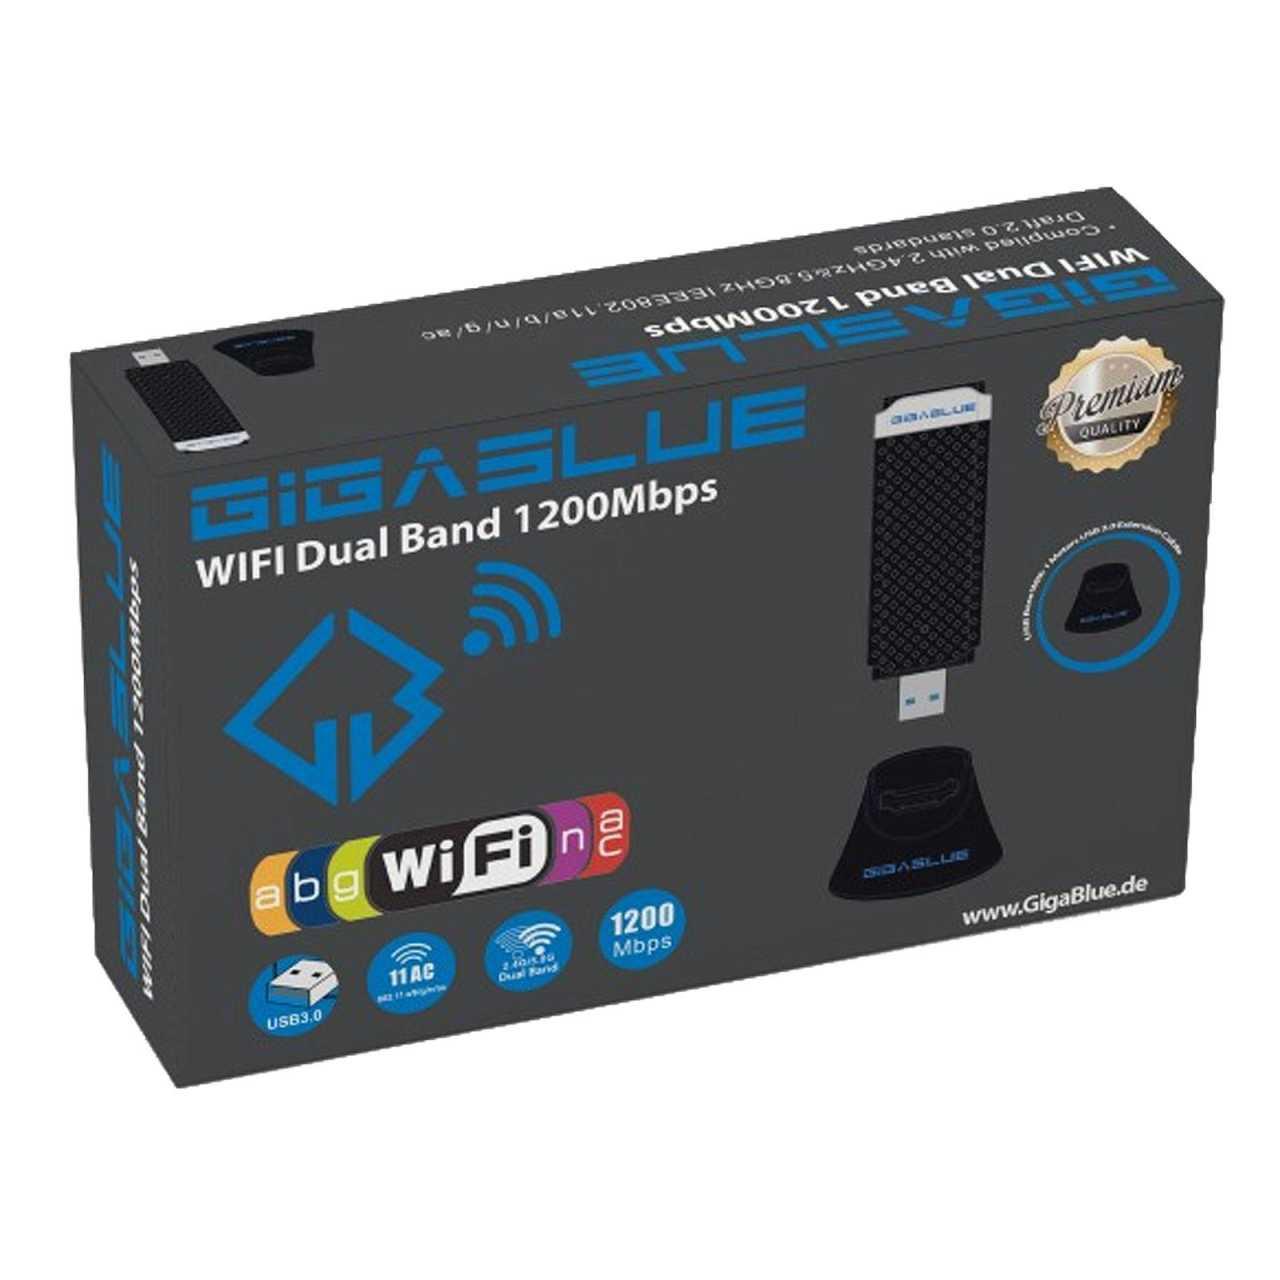 GigaBlue USB 3.0 WiFi 1200Mbit Dual Band 2,4 - 5GHz Wlan Stick 2 dBi GIGZUB013